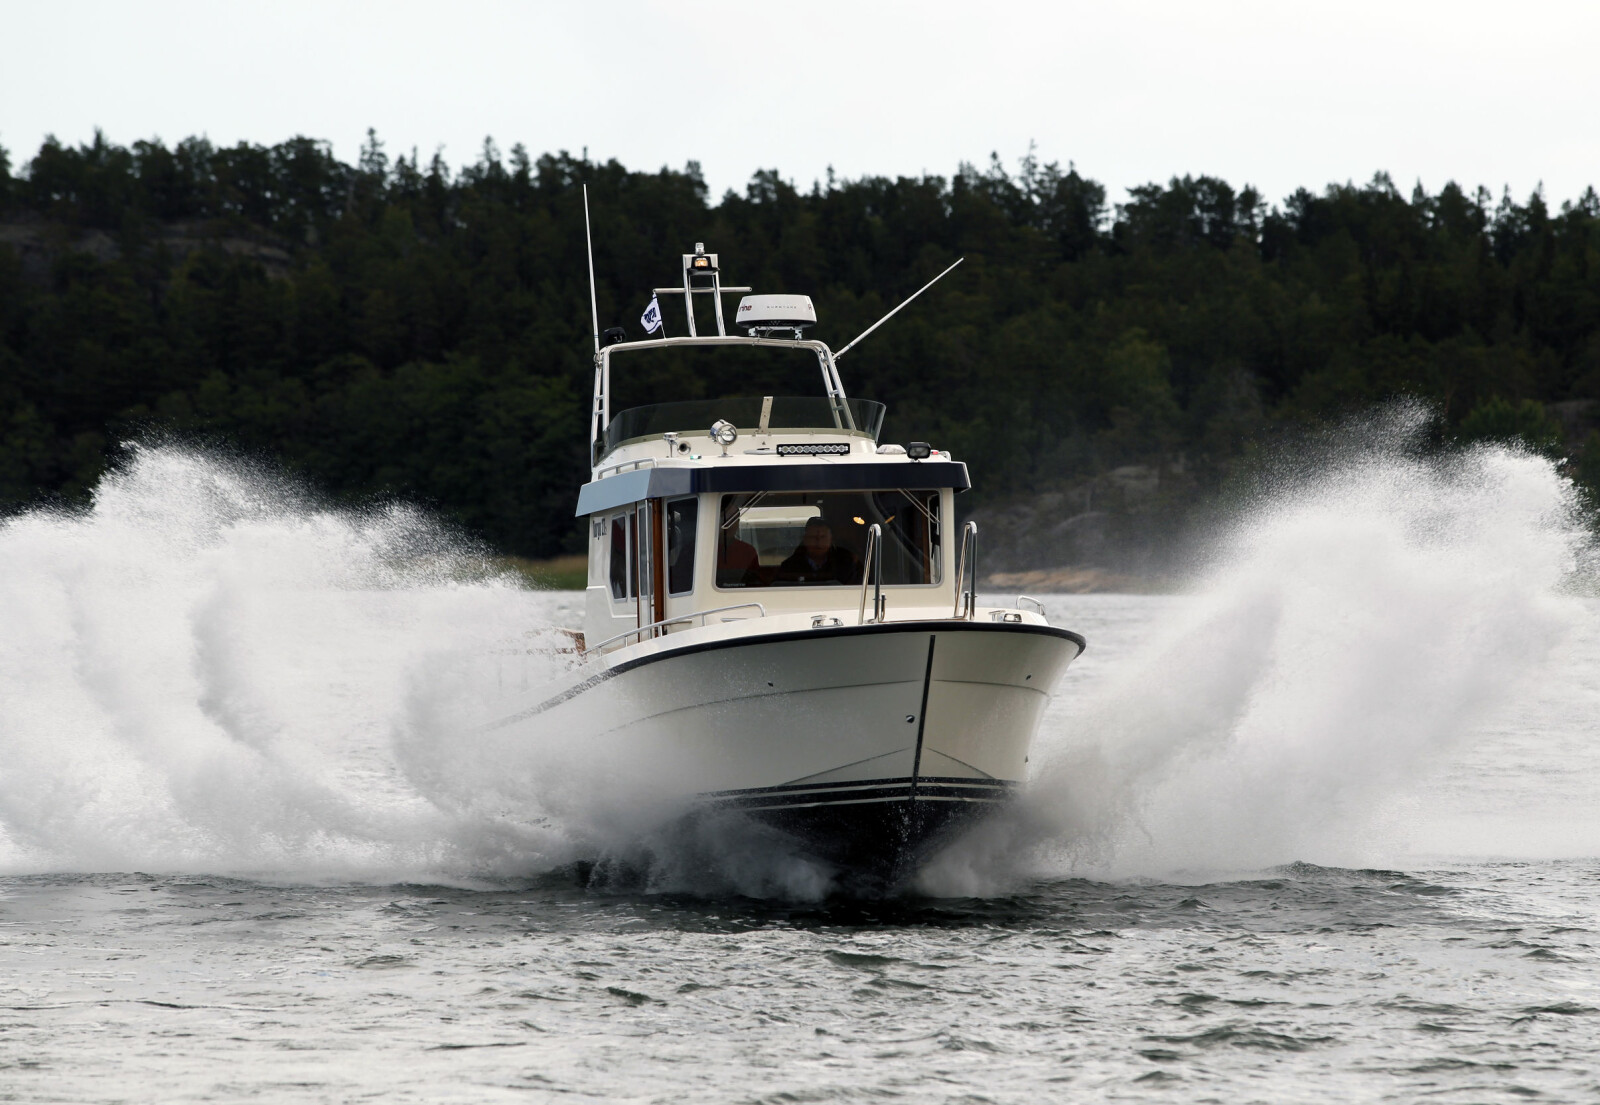 GÅR MYKT: Det klassiske skroget går dypt og mykt i sjøen, kaster opp en god del sjøsprøyt.